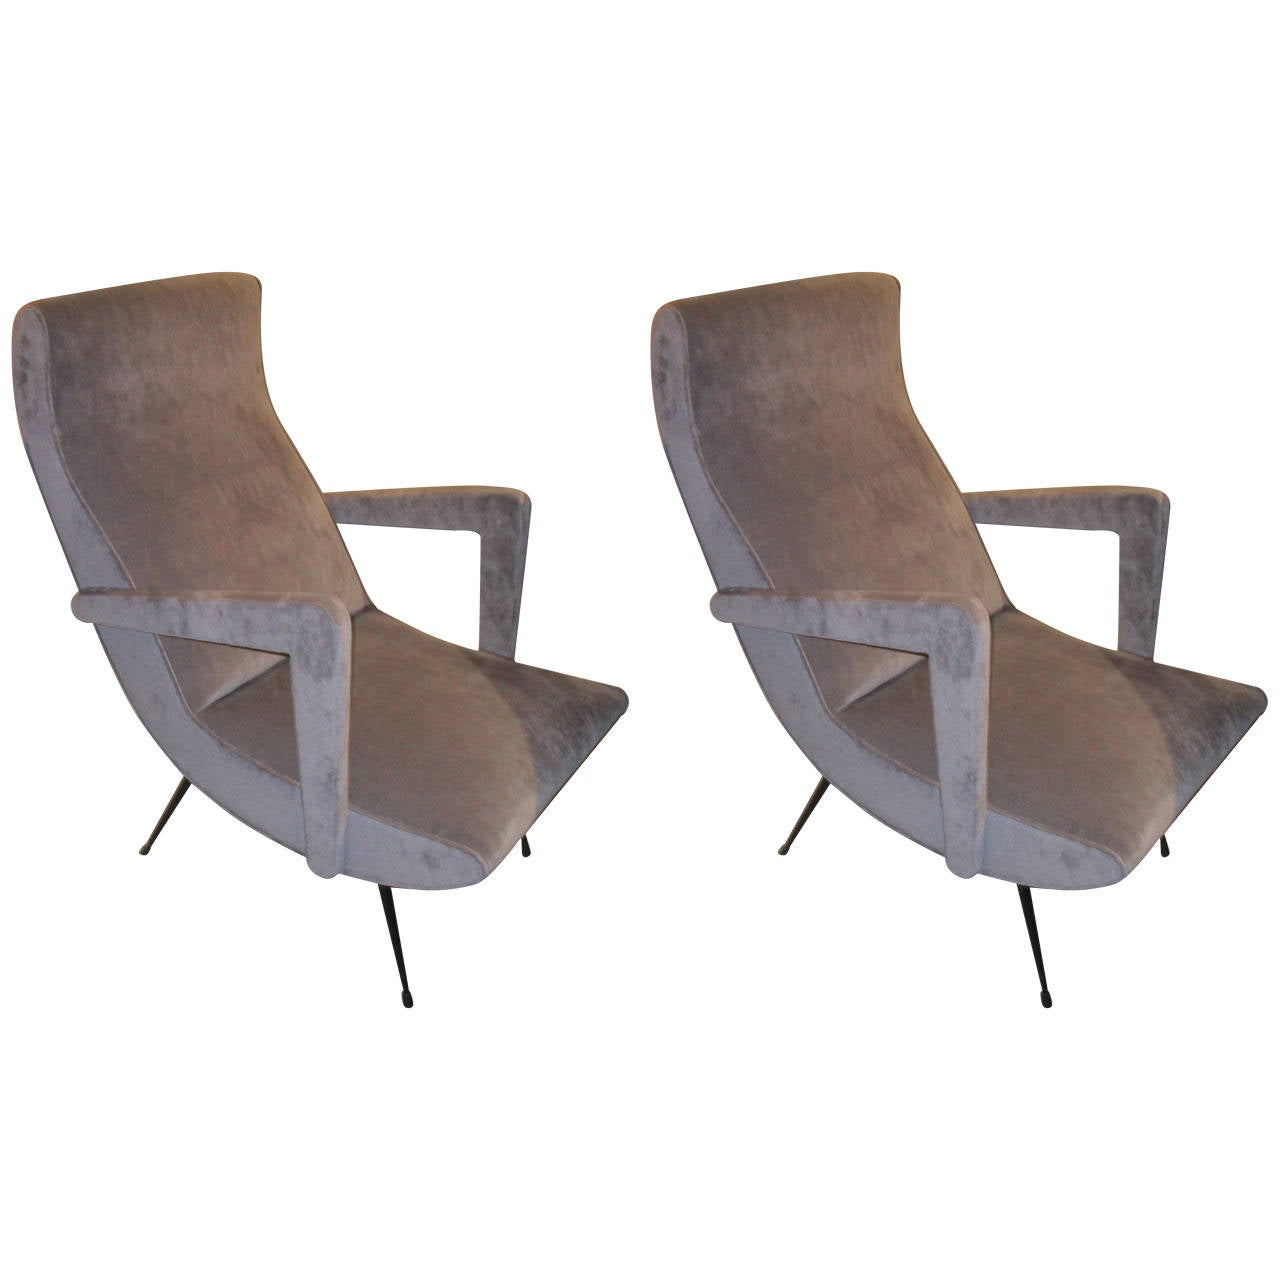 Pair of Mid Century Modern Italian Lounge Chairs